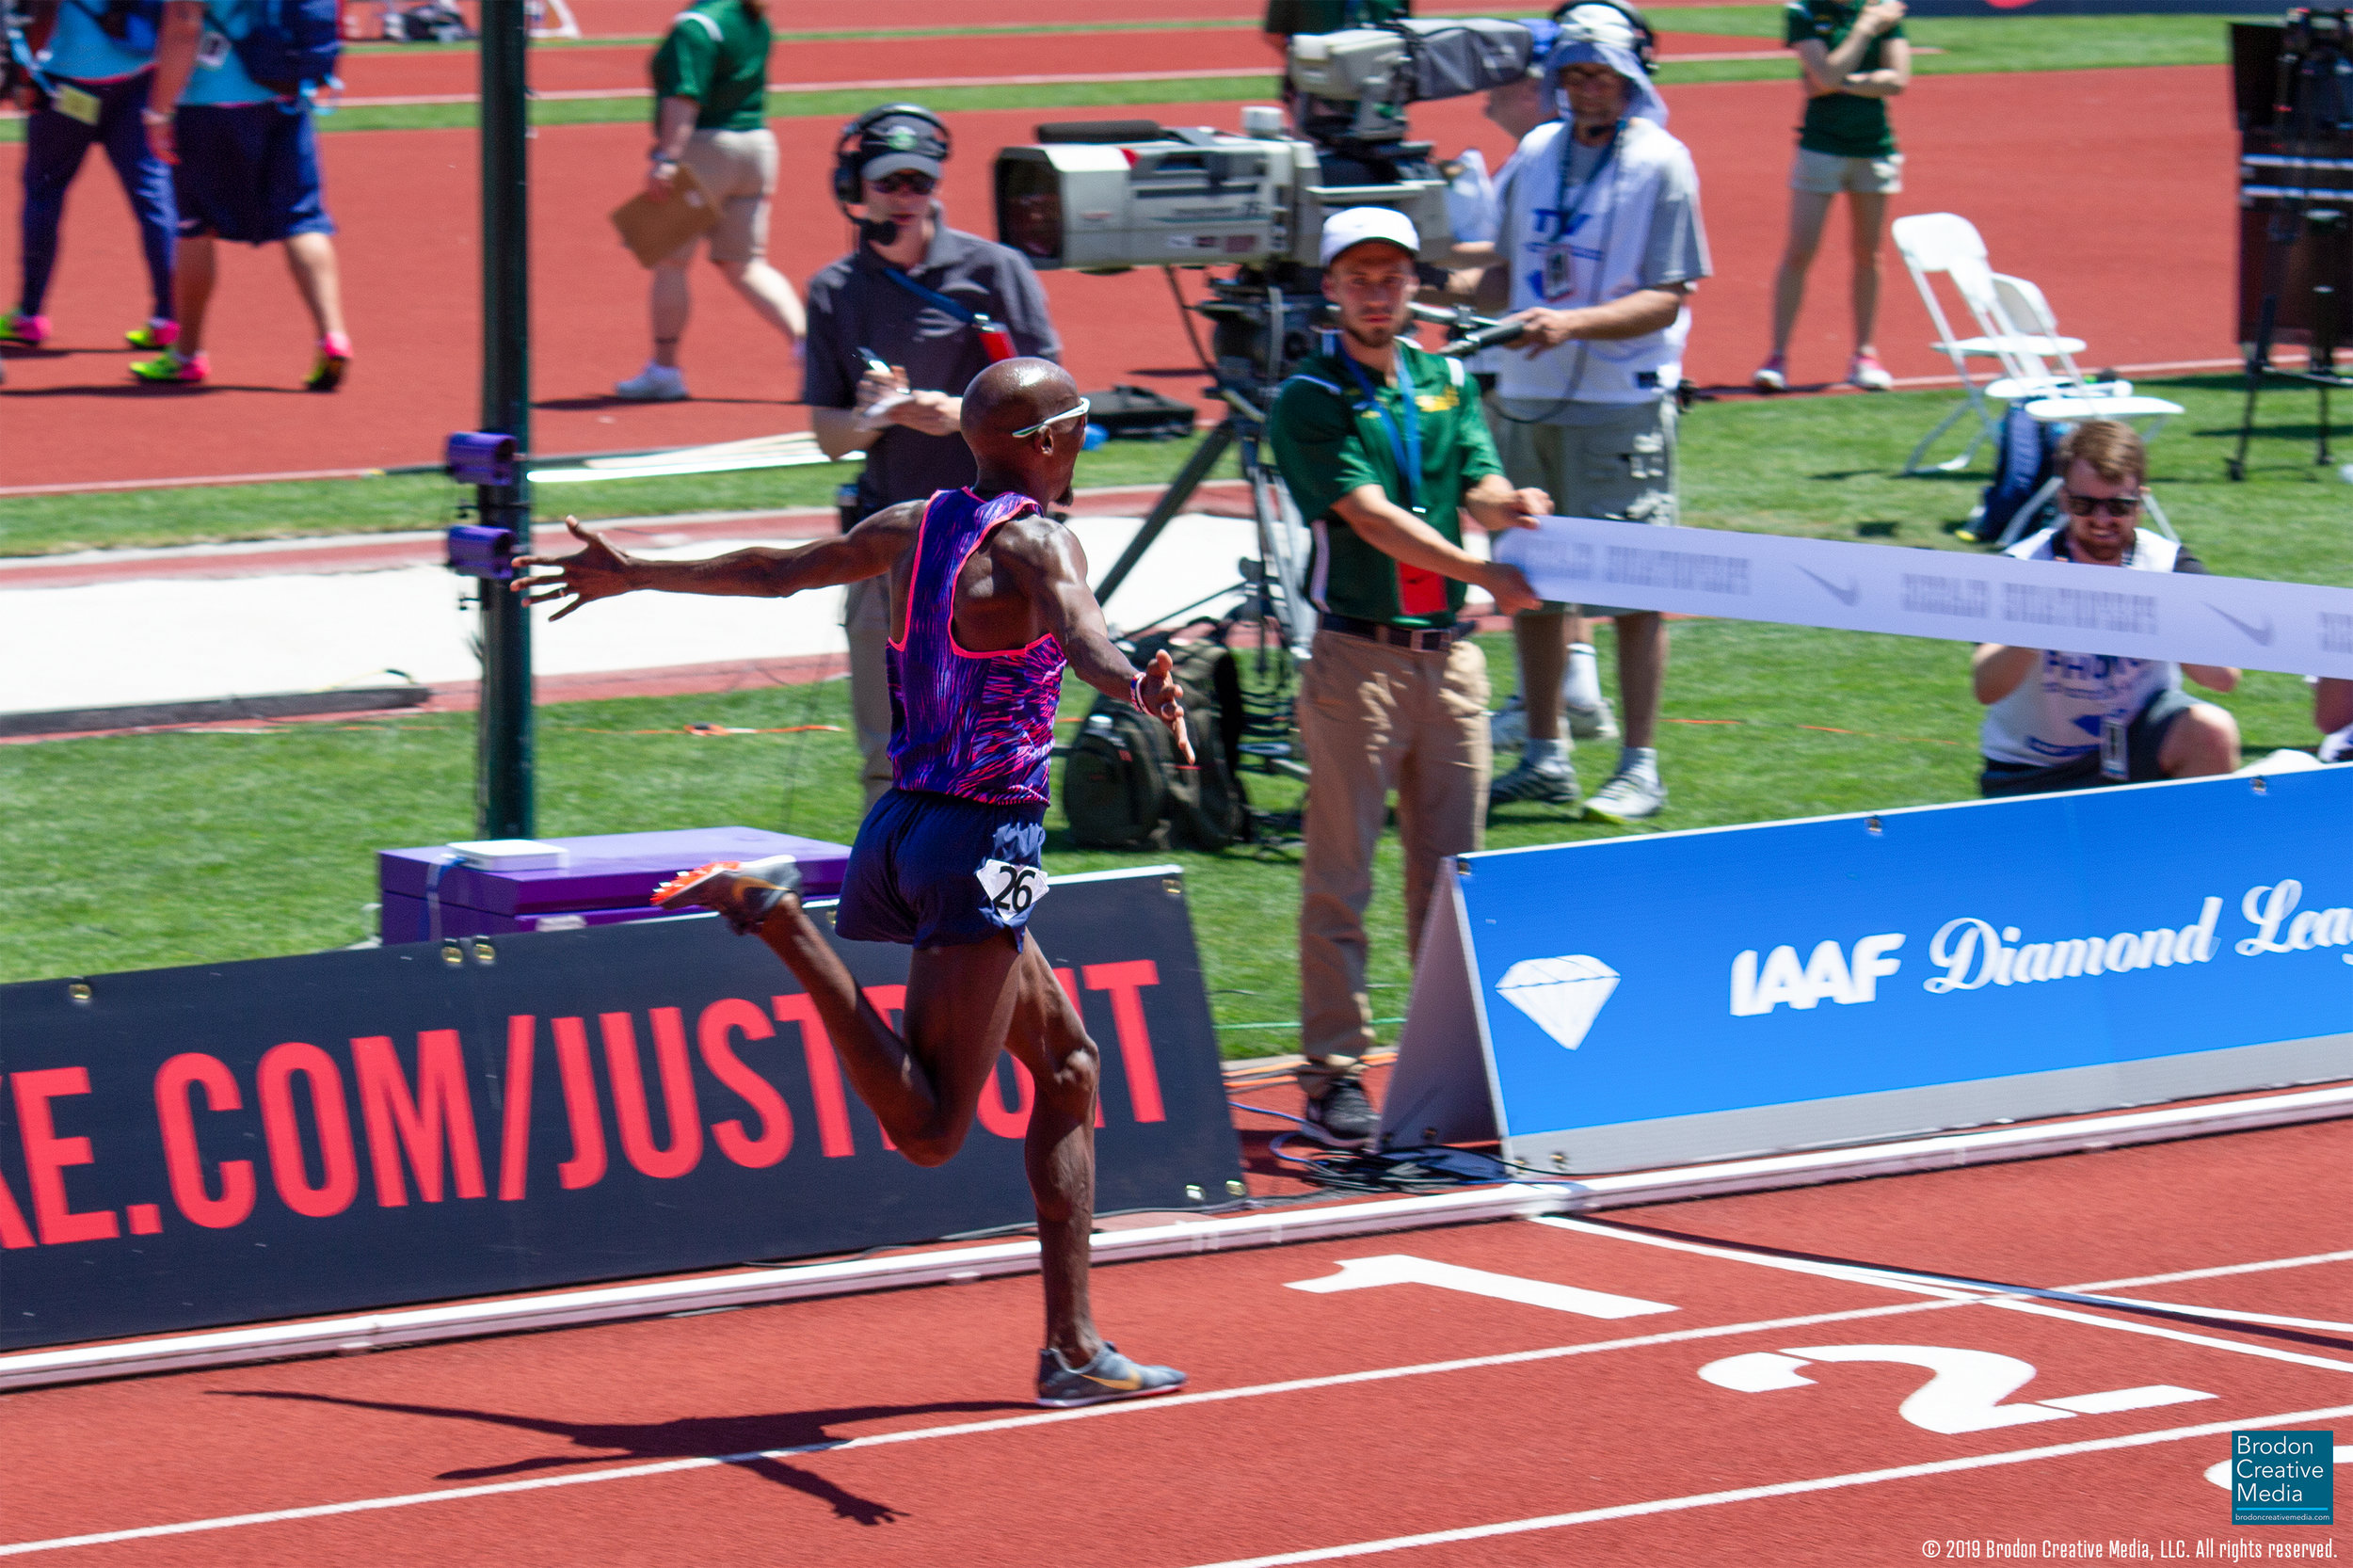 Mo Farrah, Pre Classic 2017 finish line, cropped, web - IMG_8980.jpg